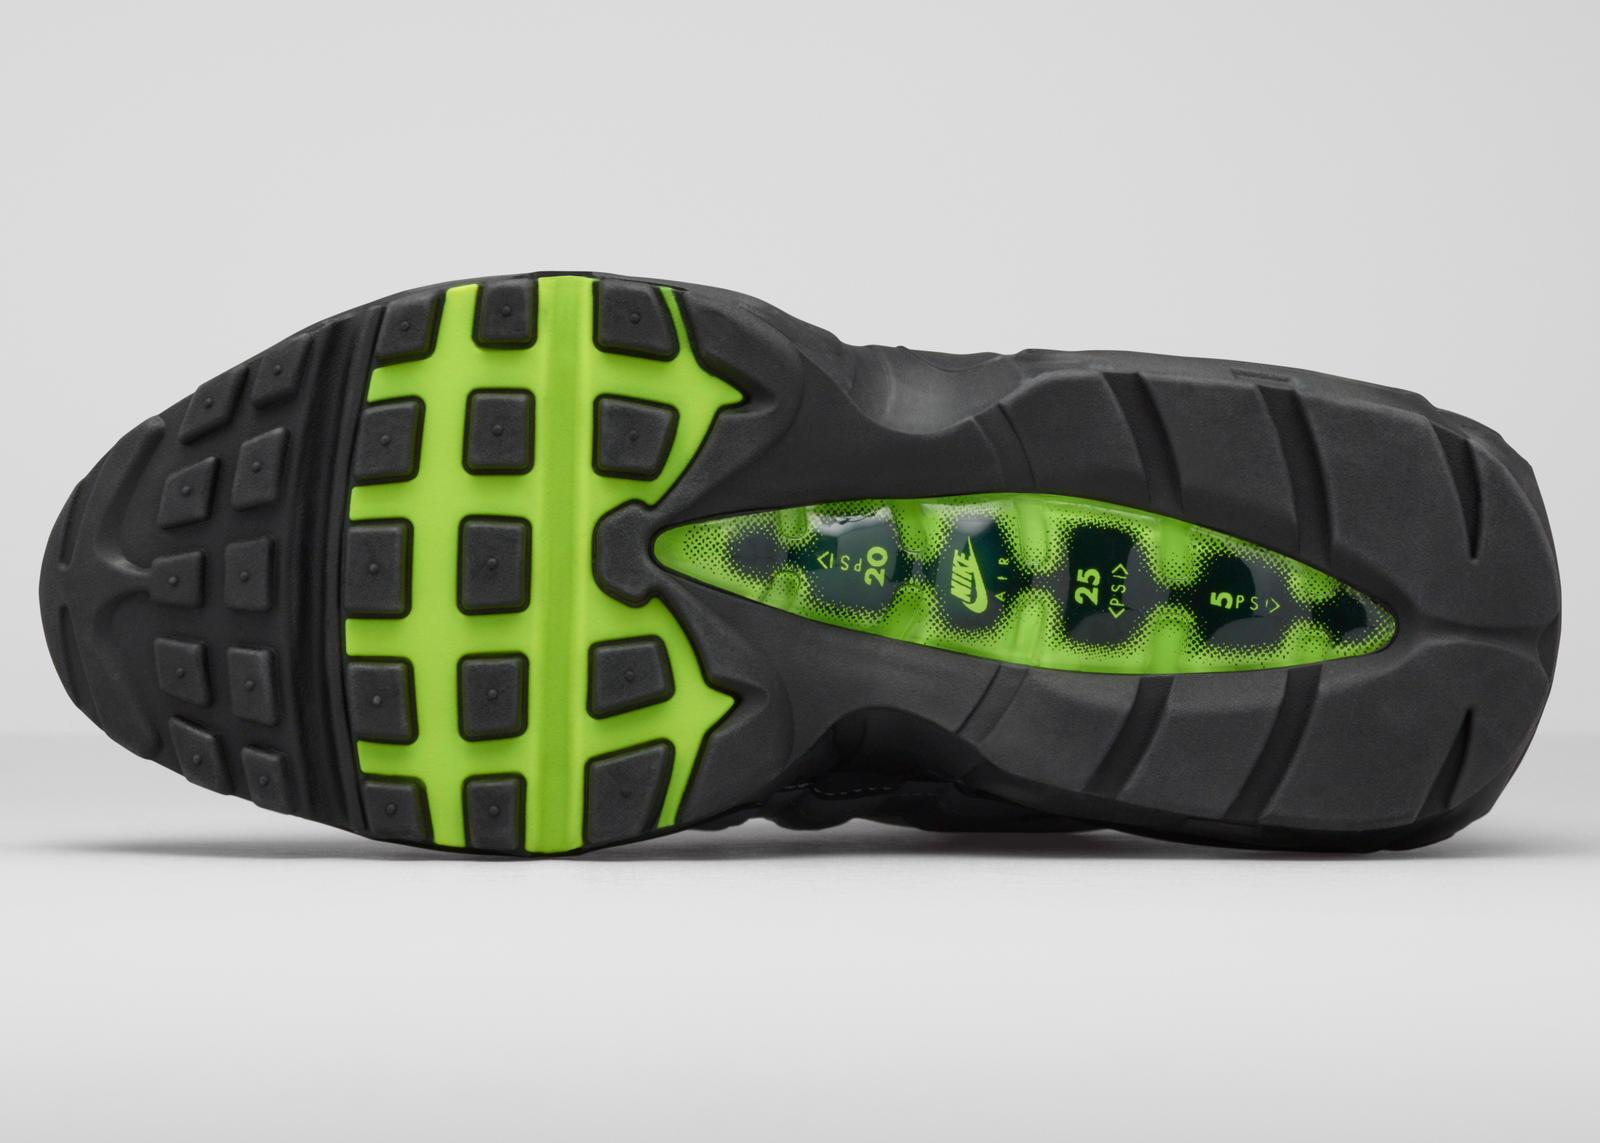 588ae13fdf mns-am95-og-2. Precisely 7,328 days ago, the Sergio Lozano-designed Nike  Air Max 95 introduced a futurist ...